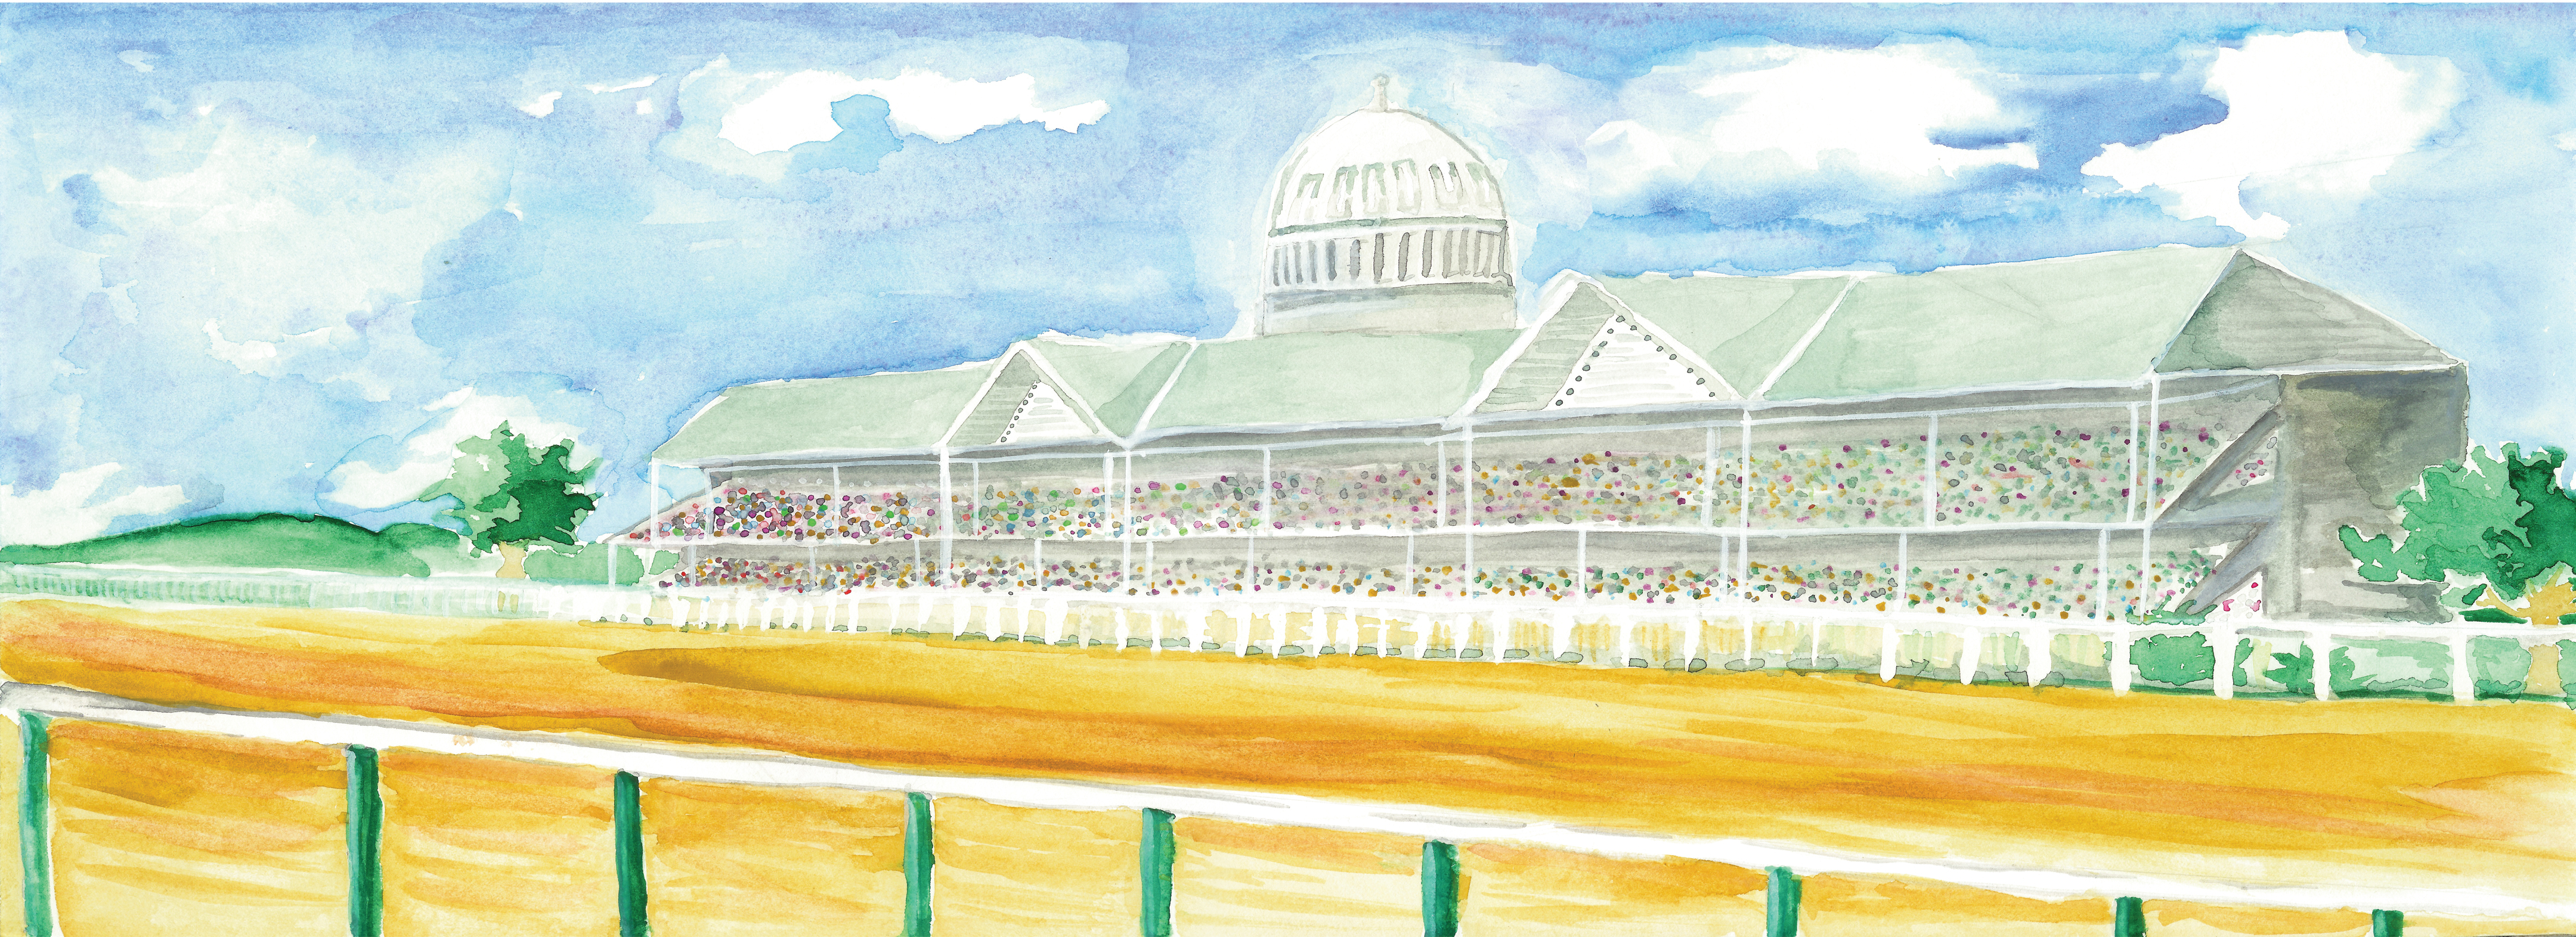 Horse Racing clipart racetrack #5